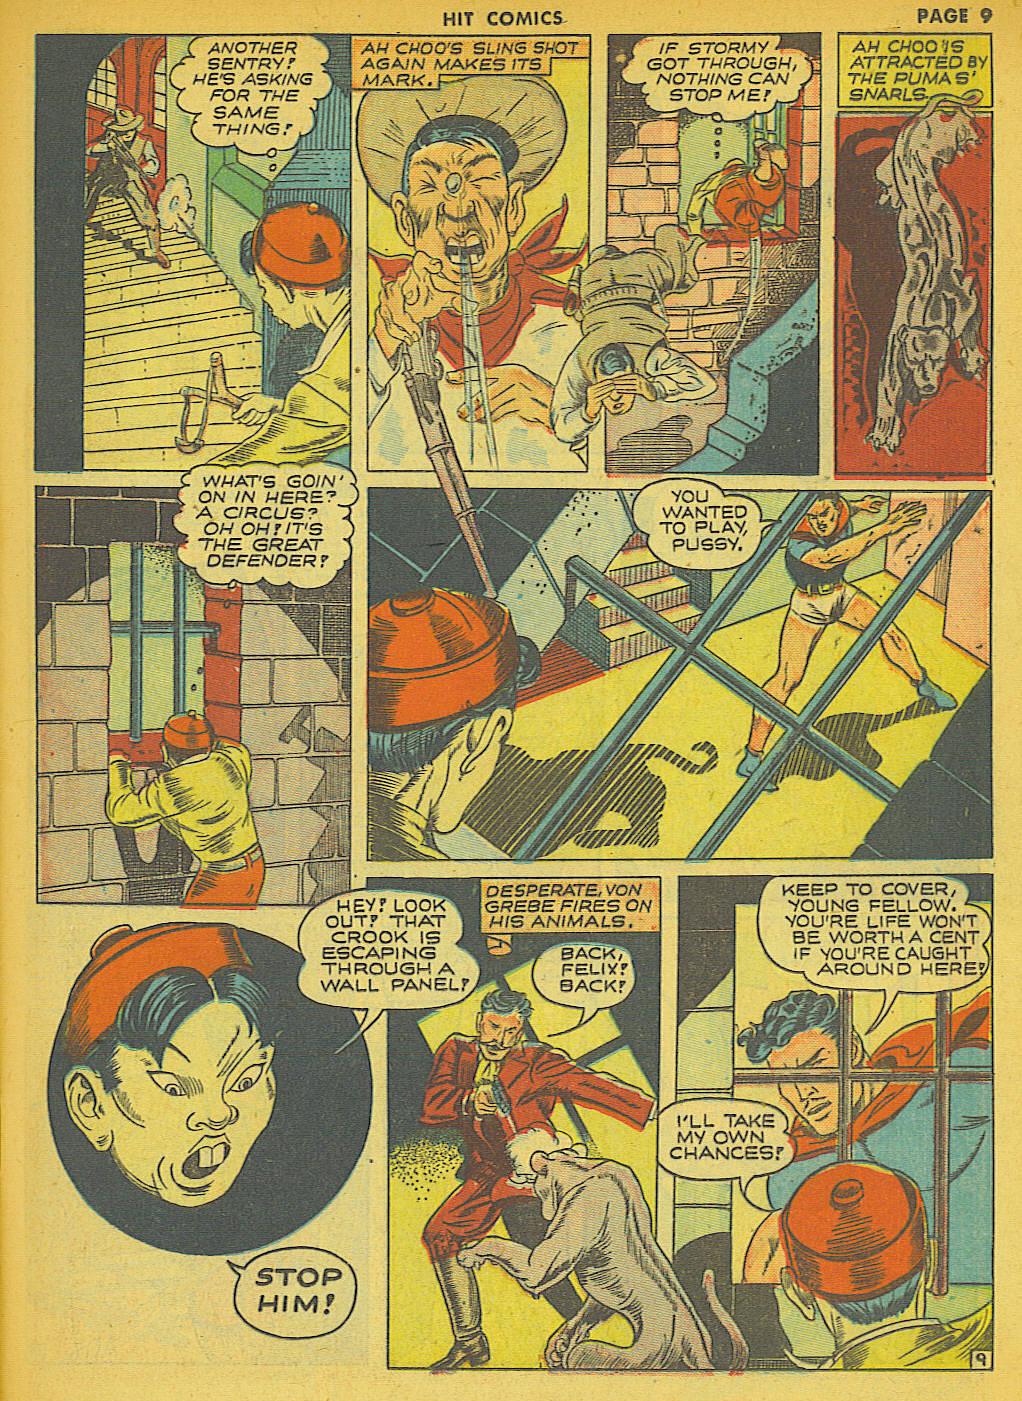 Read online Hit Comics comic -  Issue #21 - 11